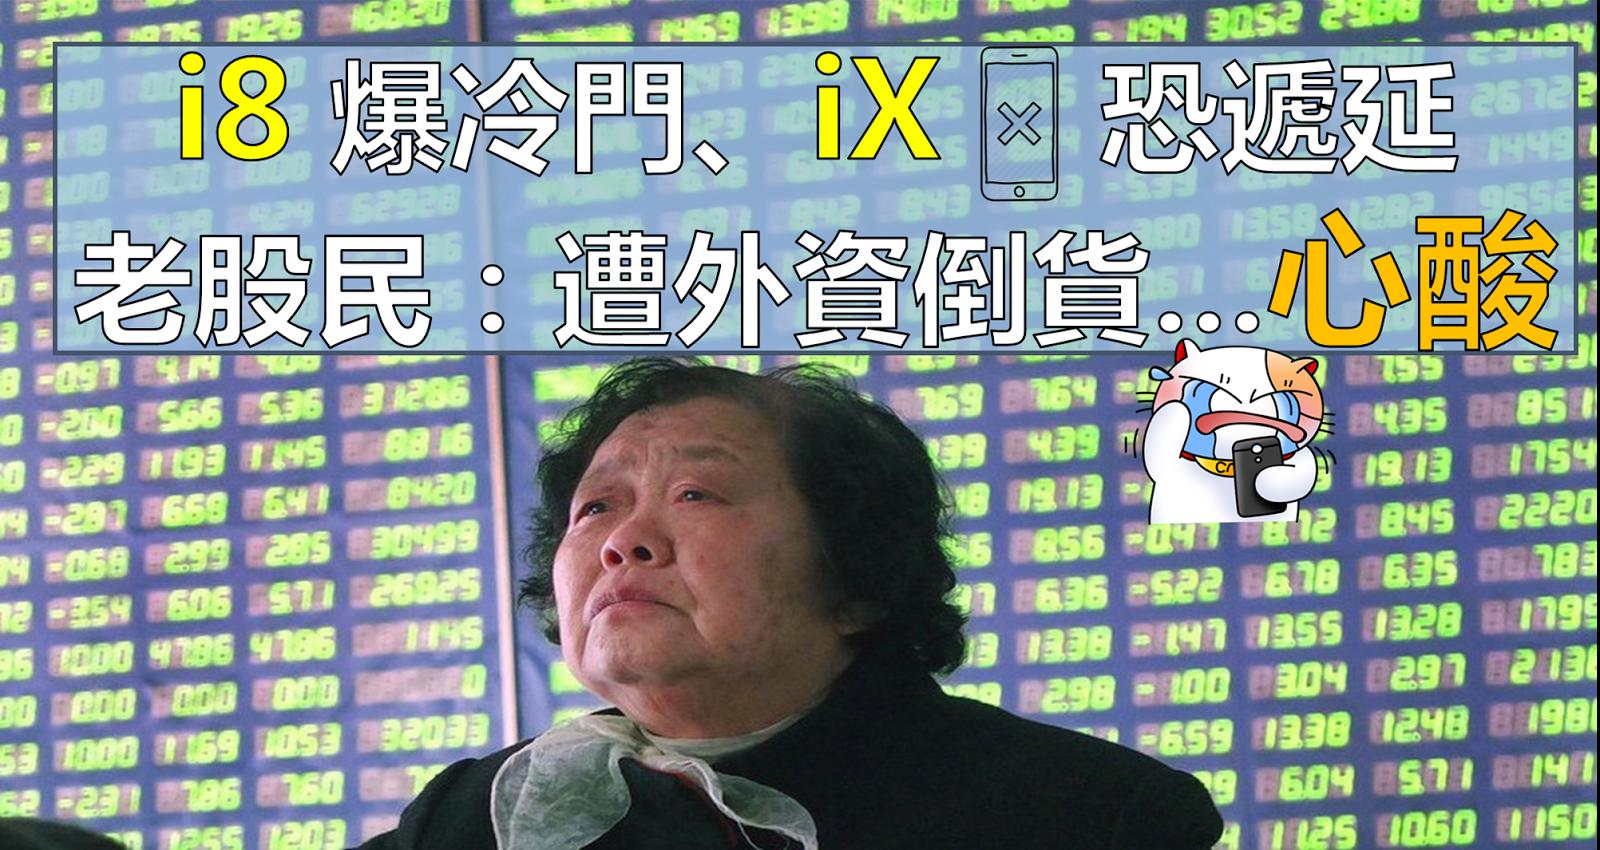 i8 爆冷門、iX 恐遞延,創 2007 年 iPhone 開賣最差!老股民:鴻海 遭外資倒貨,心酸